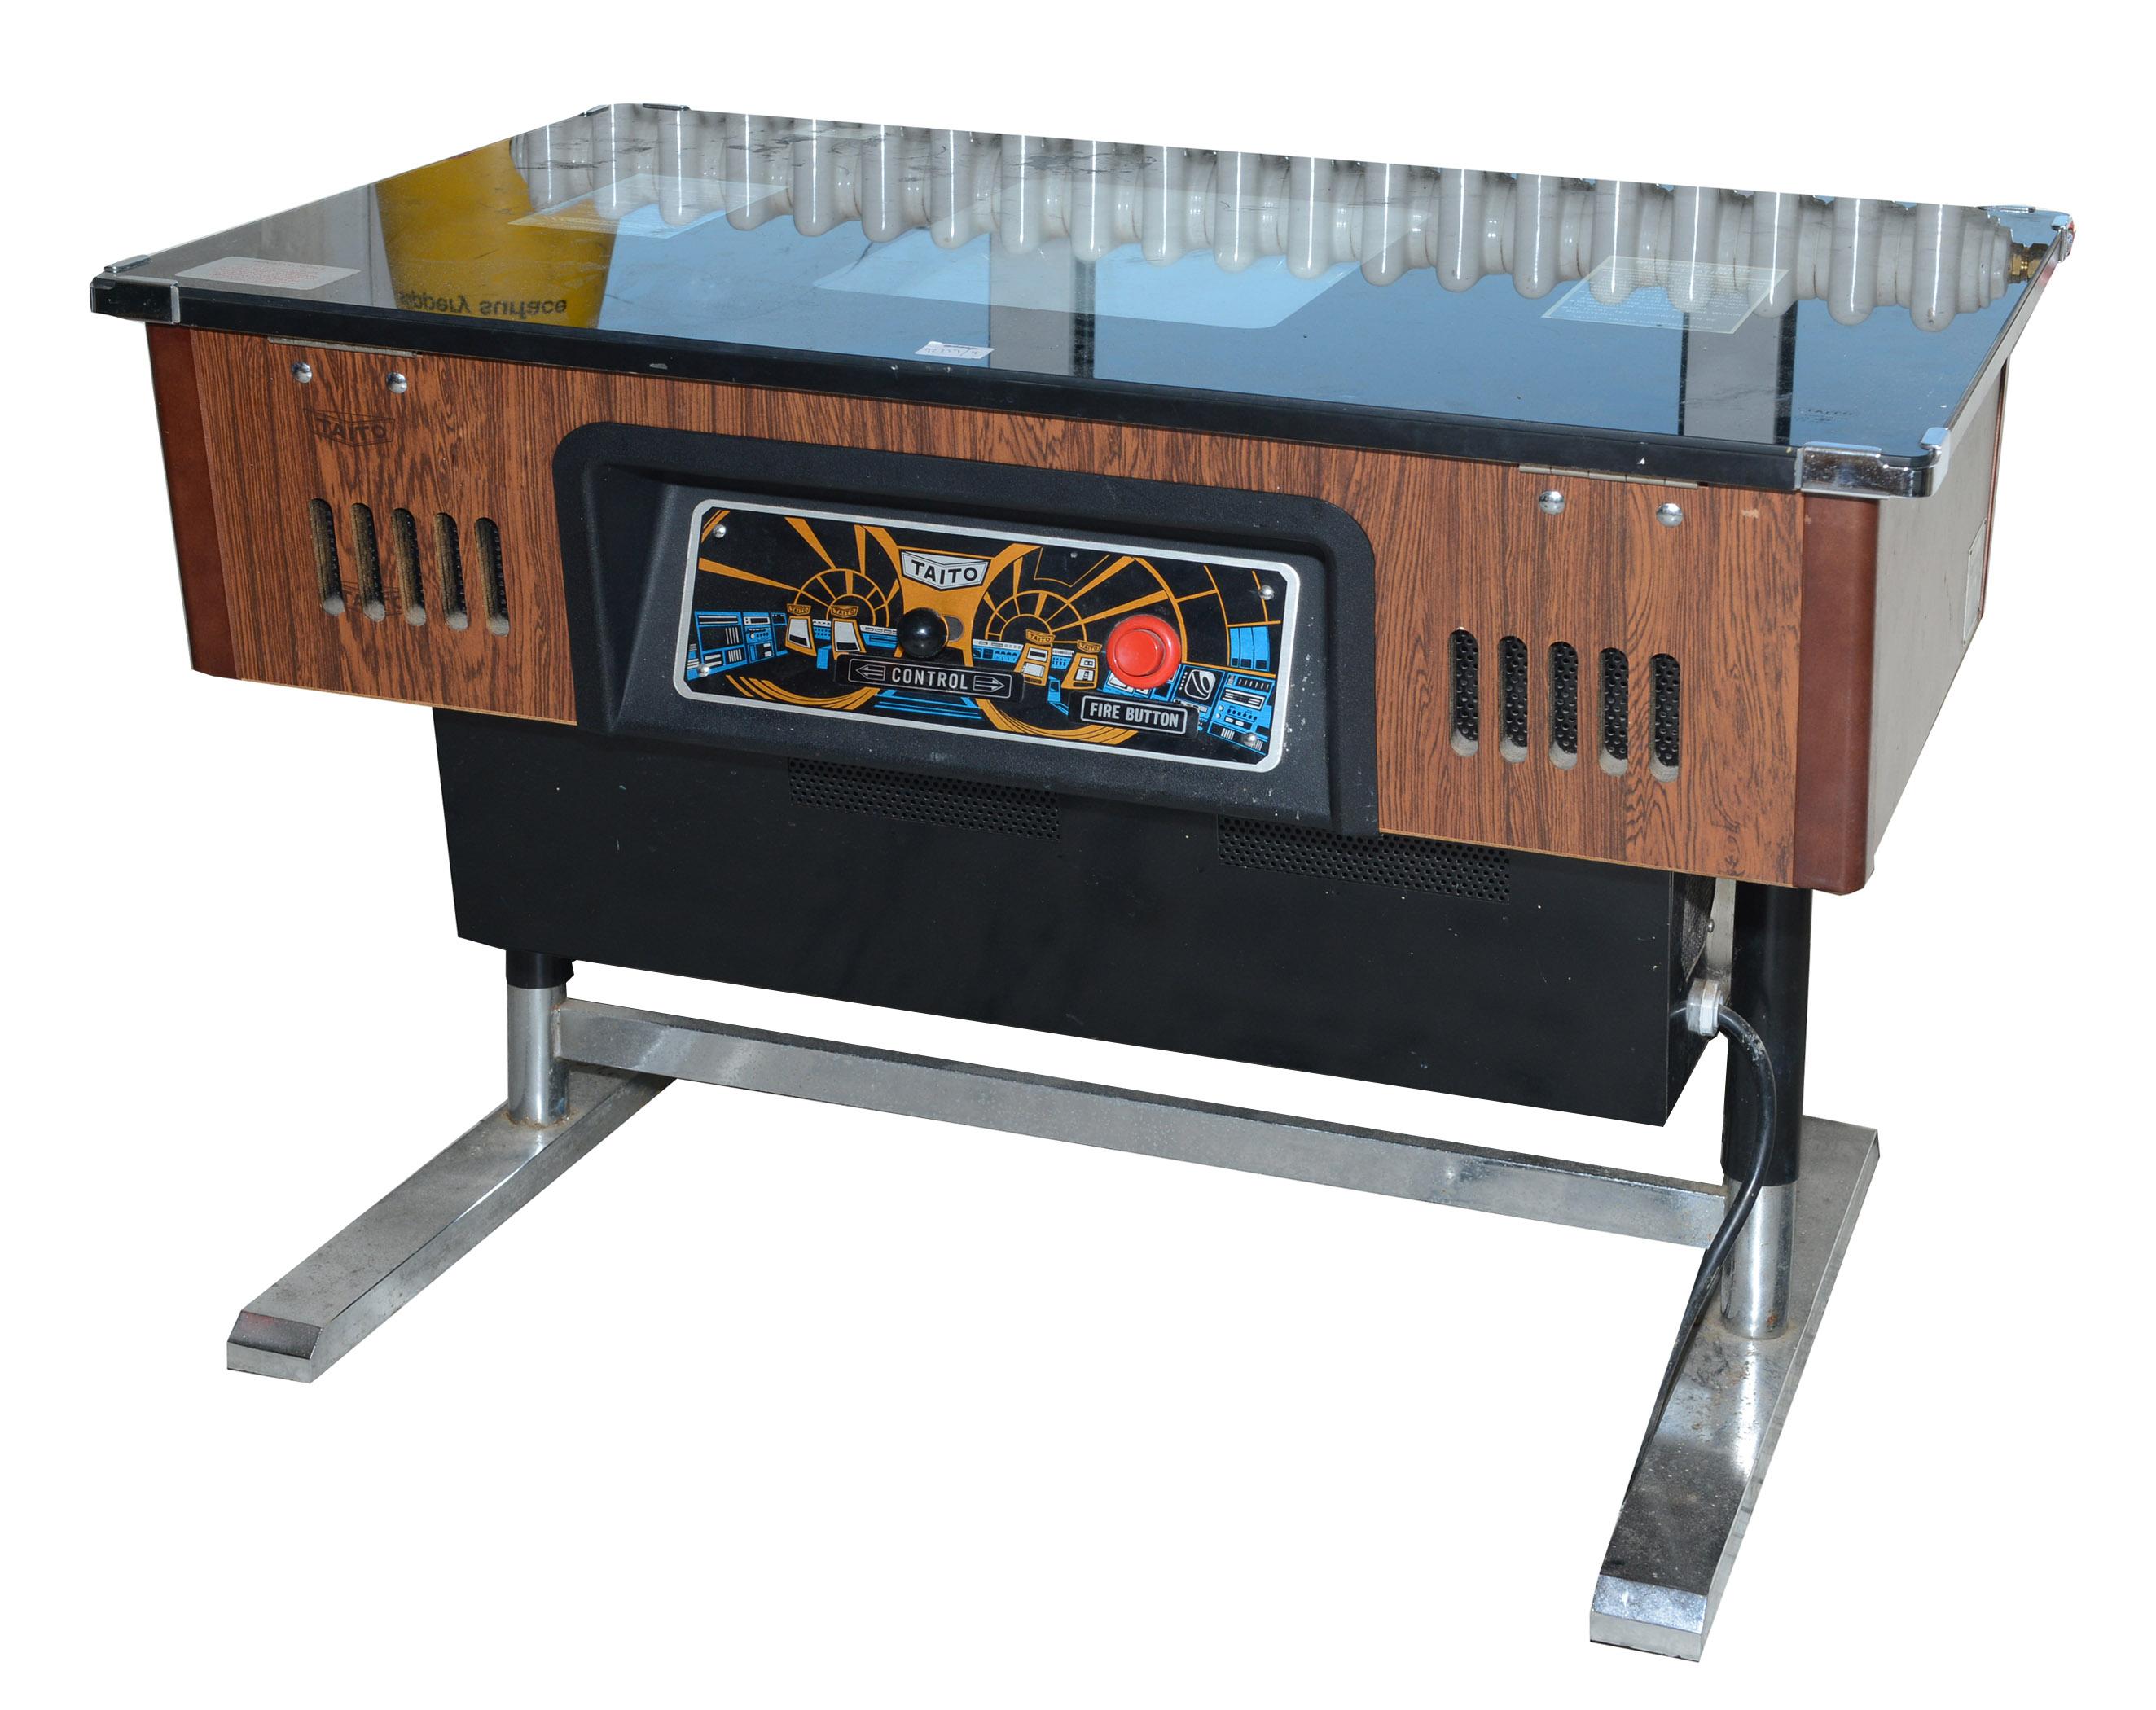 Taito Space Invaders Arcade Machine A Coffee Table Arcade